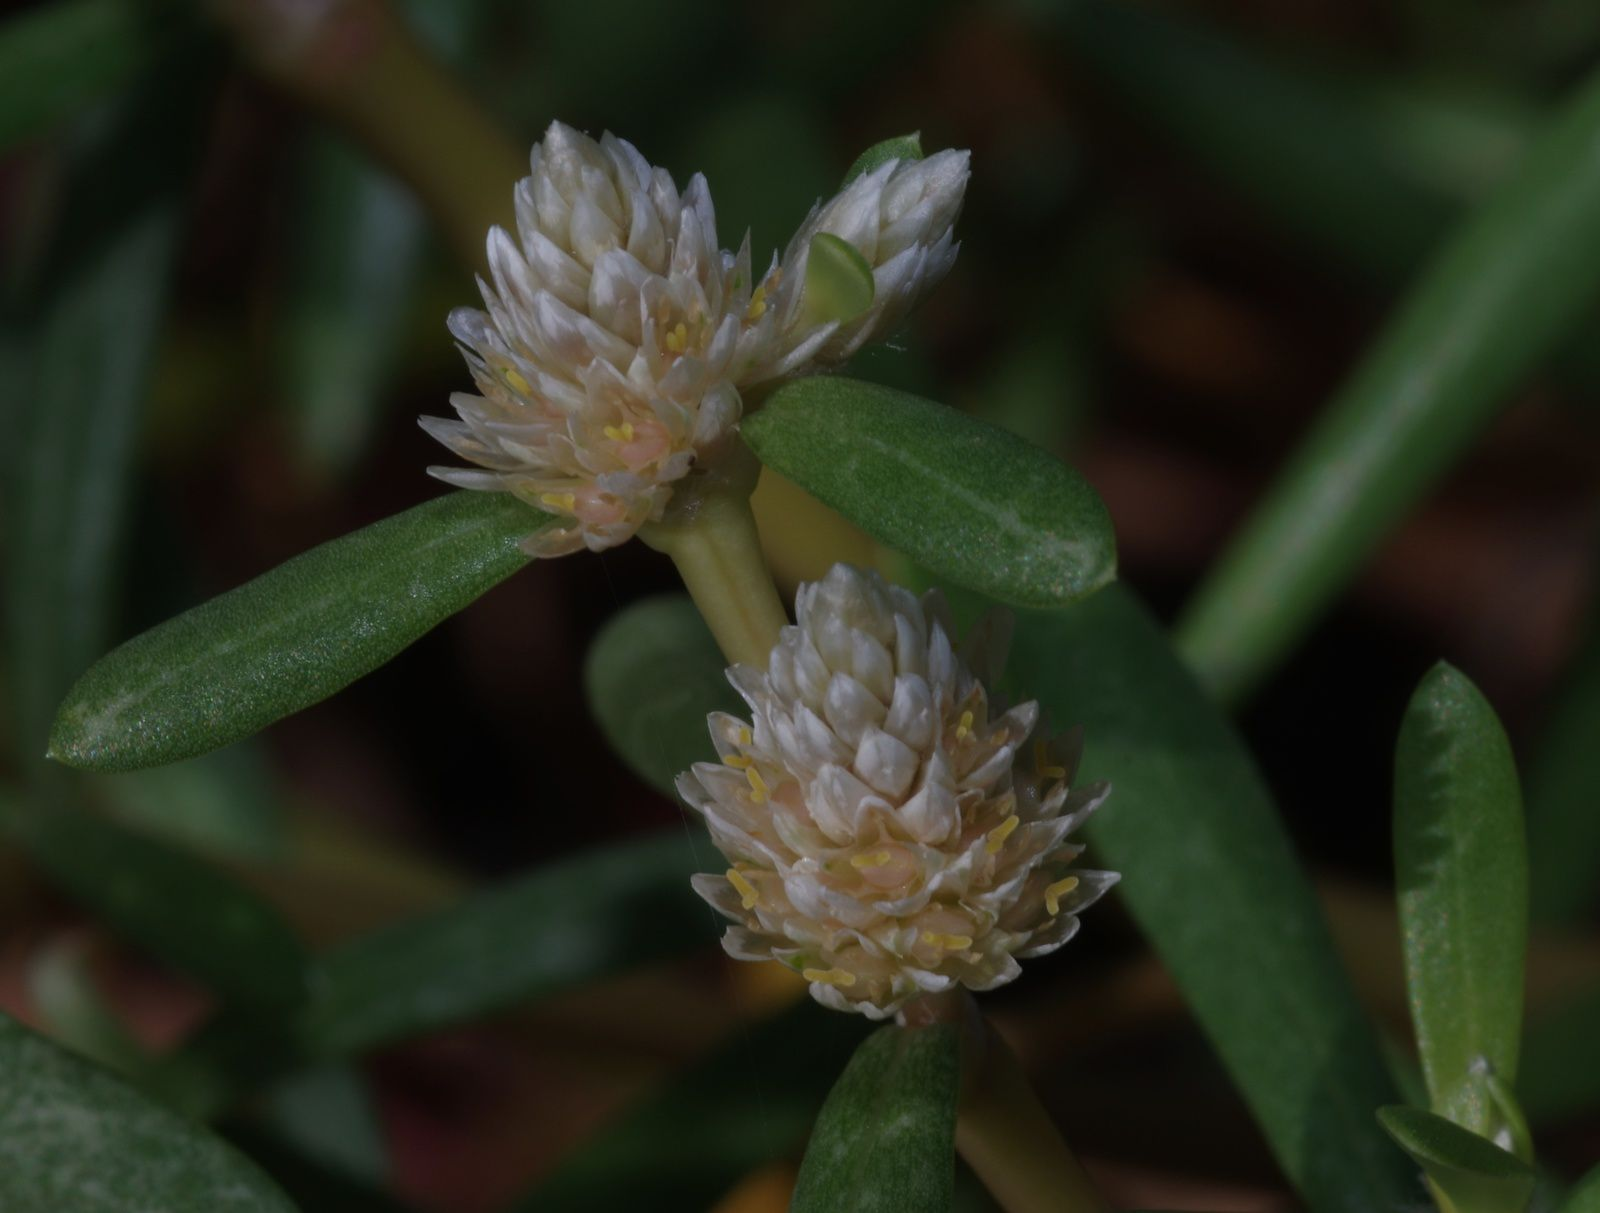 Blutaparon vermiculare (amaranthe bord-de-mer)